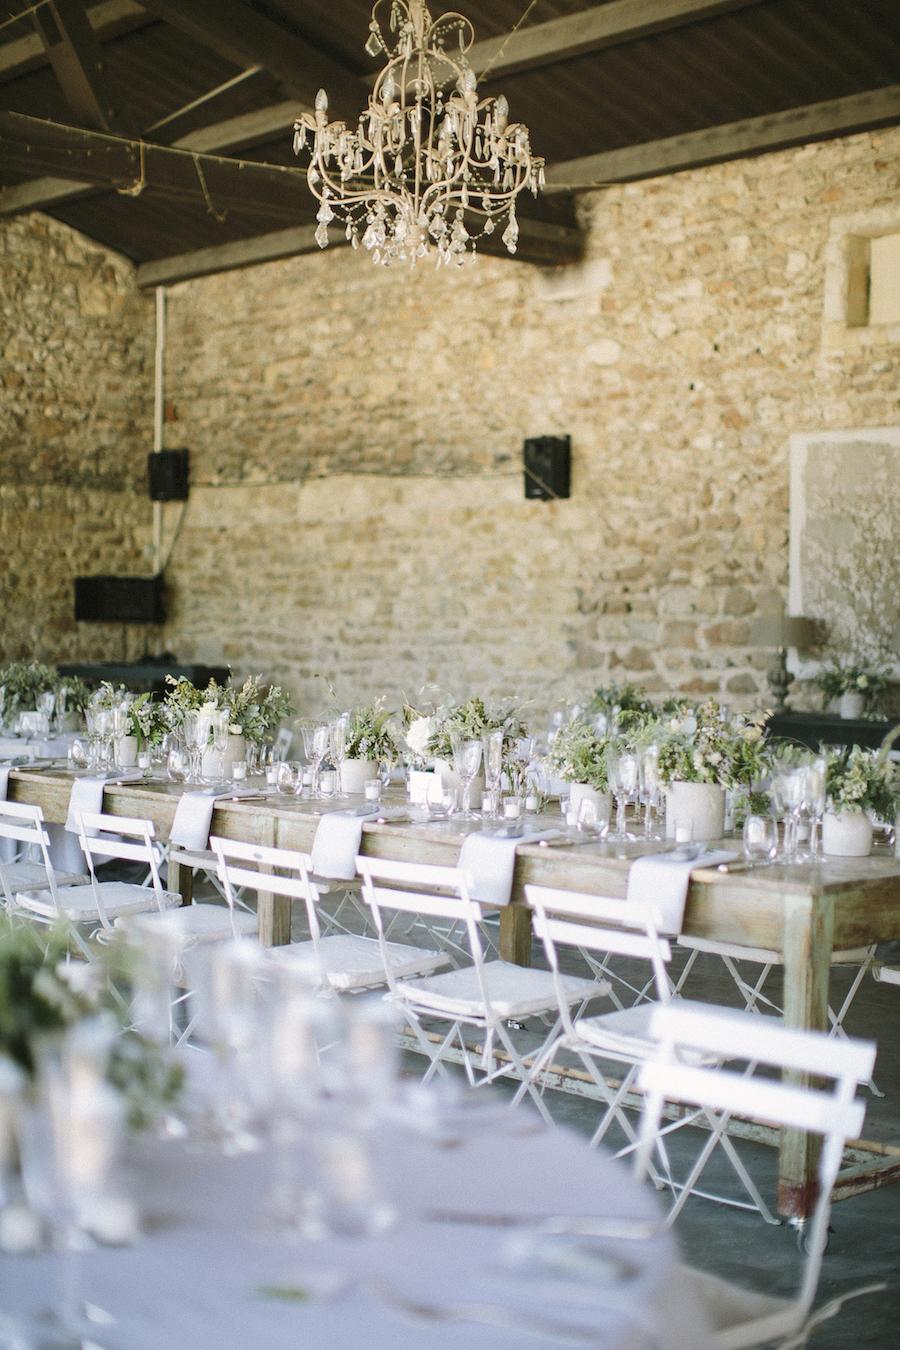 saya-photography-rustic-french-wedding-provence-domaines-de-patras-60.jpg